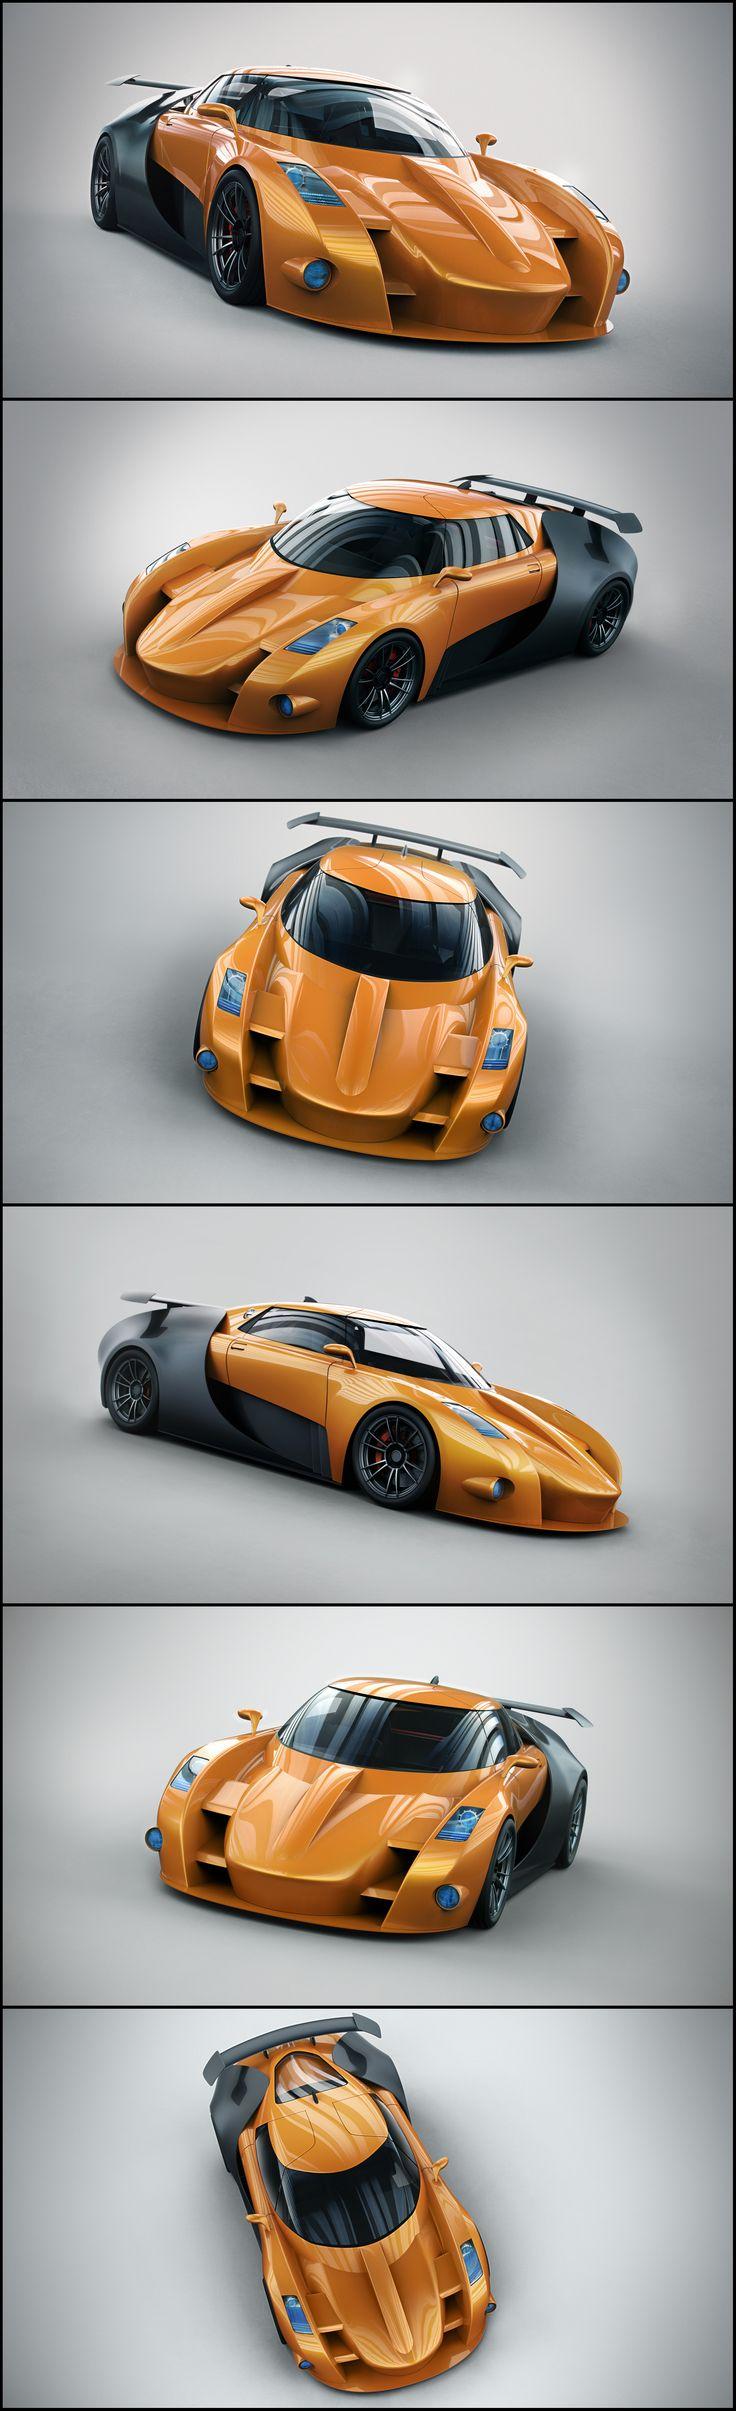 Car Concept by Aleksandr Kuskov, Ukraine